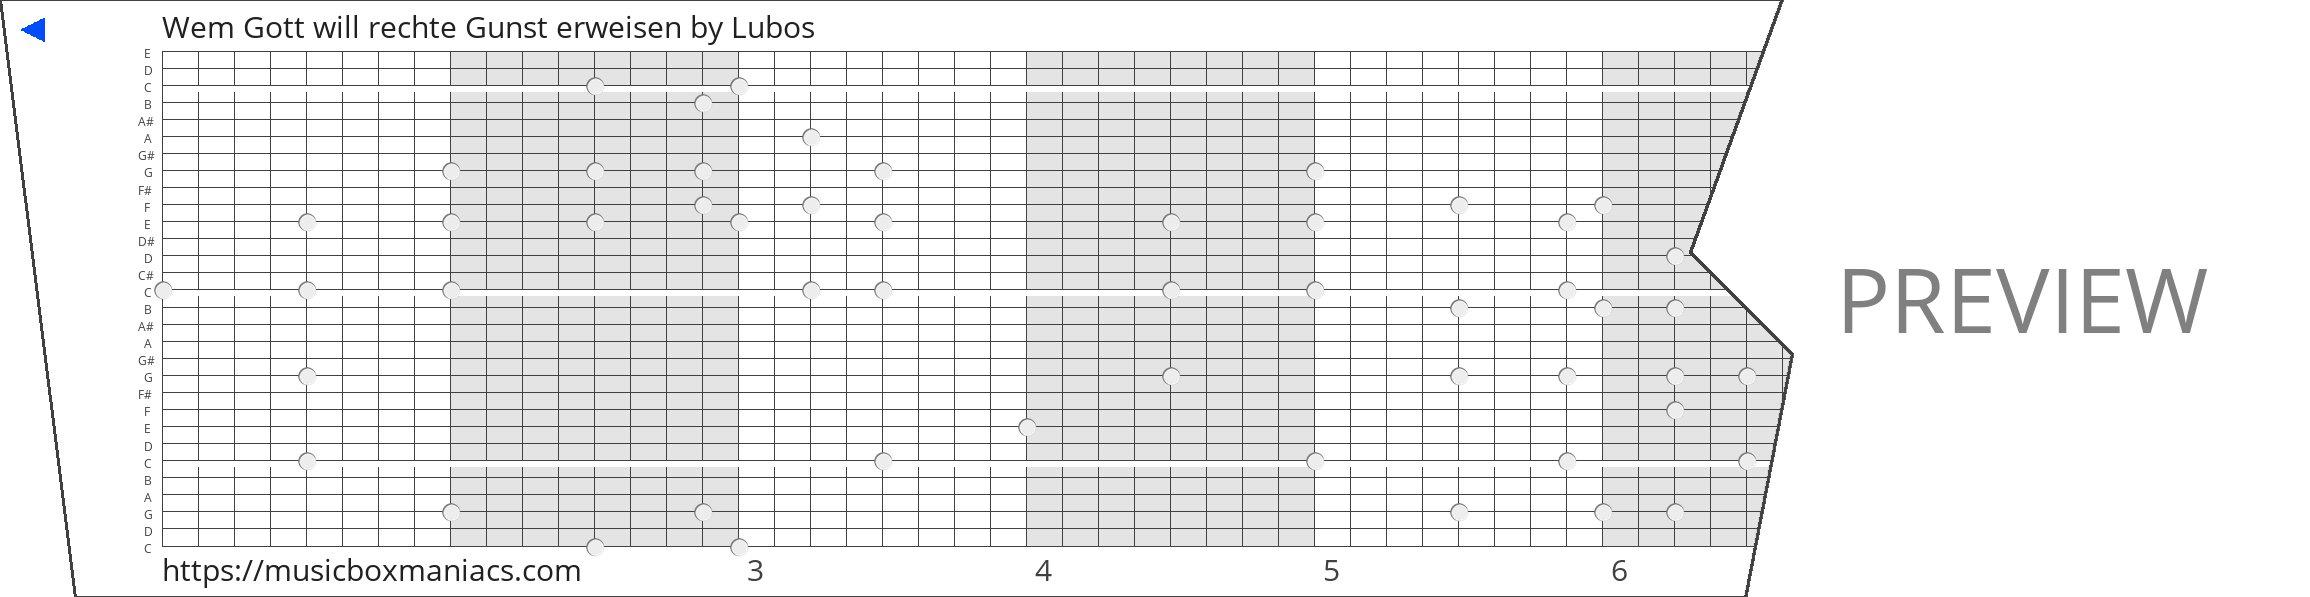 Wem Gott will rechte Gunst erweisen 30 note music box paper strip